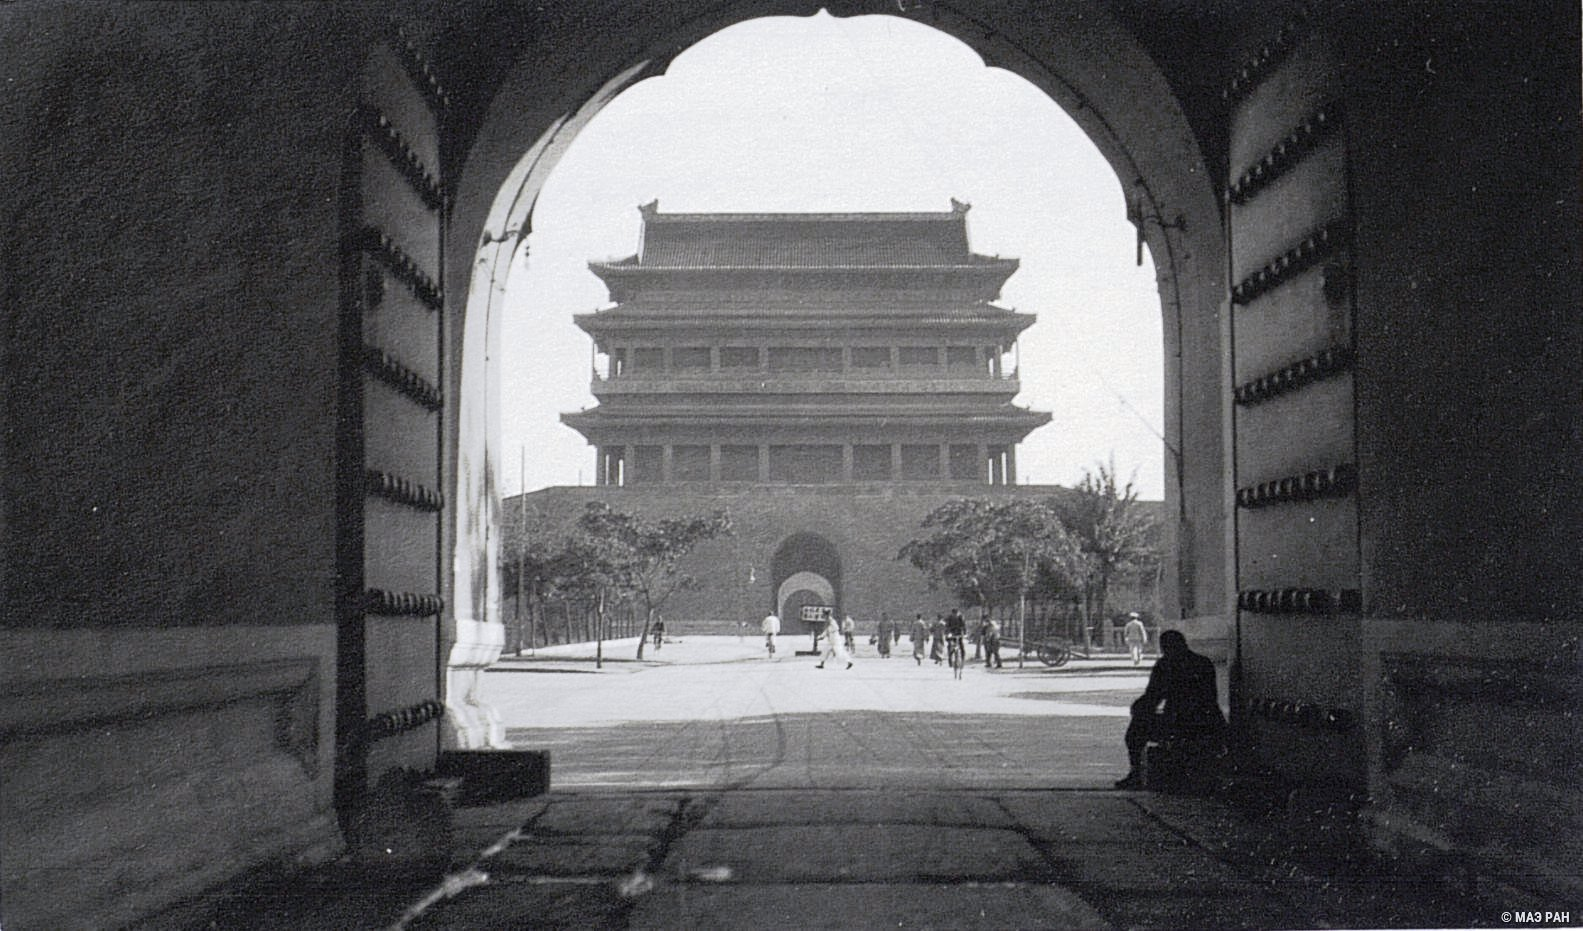 Ворота и дорога от дворцов к Храму Неба